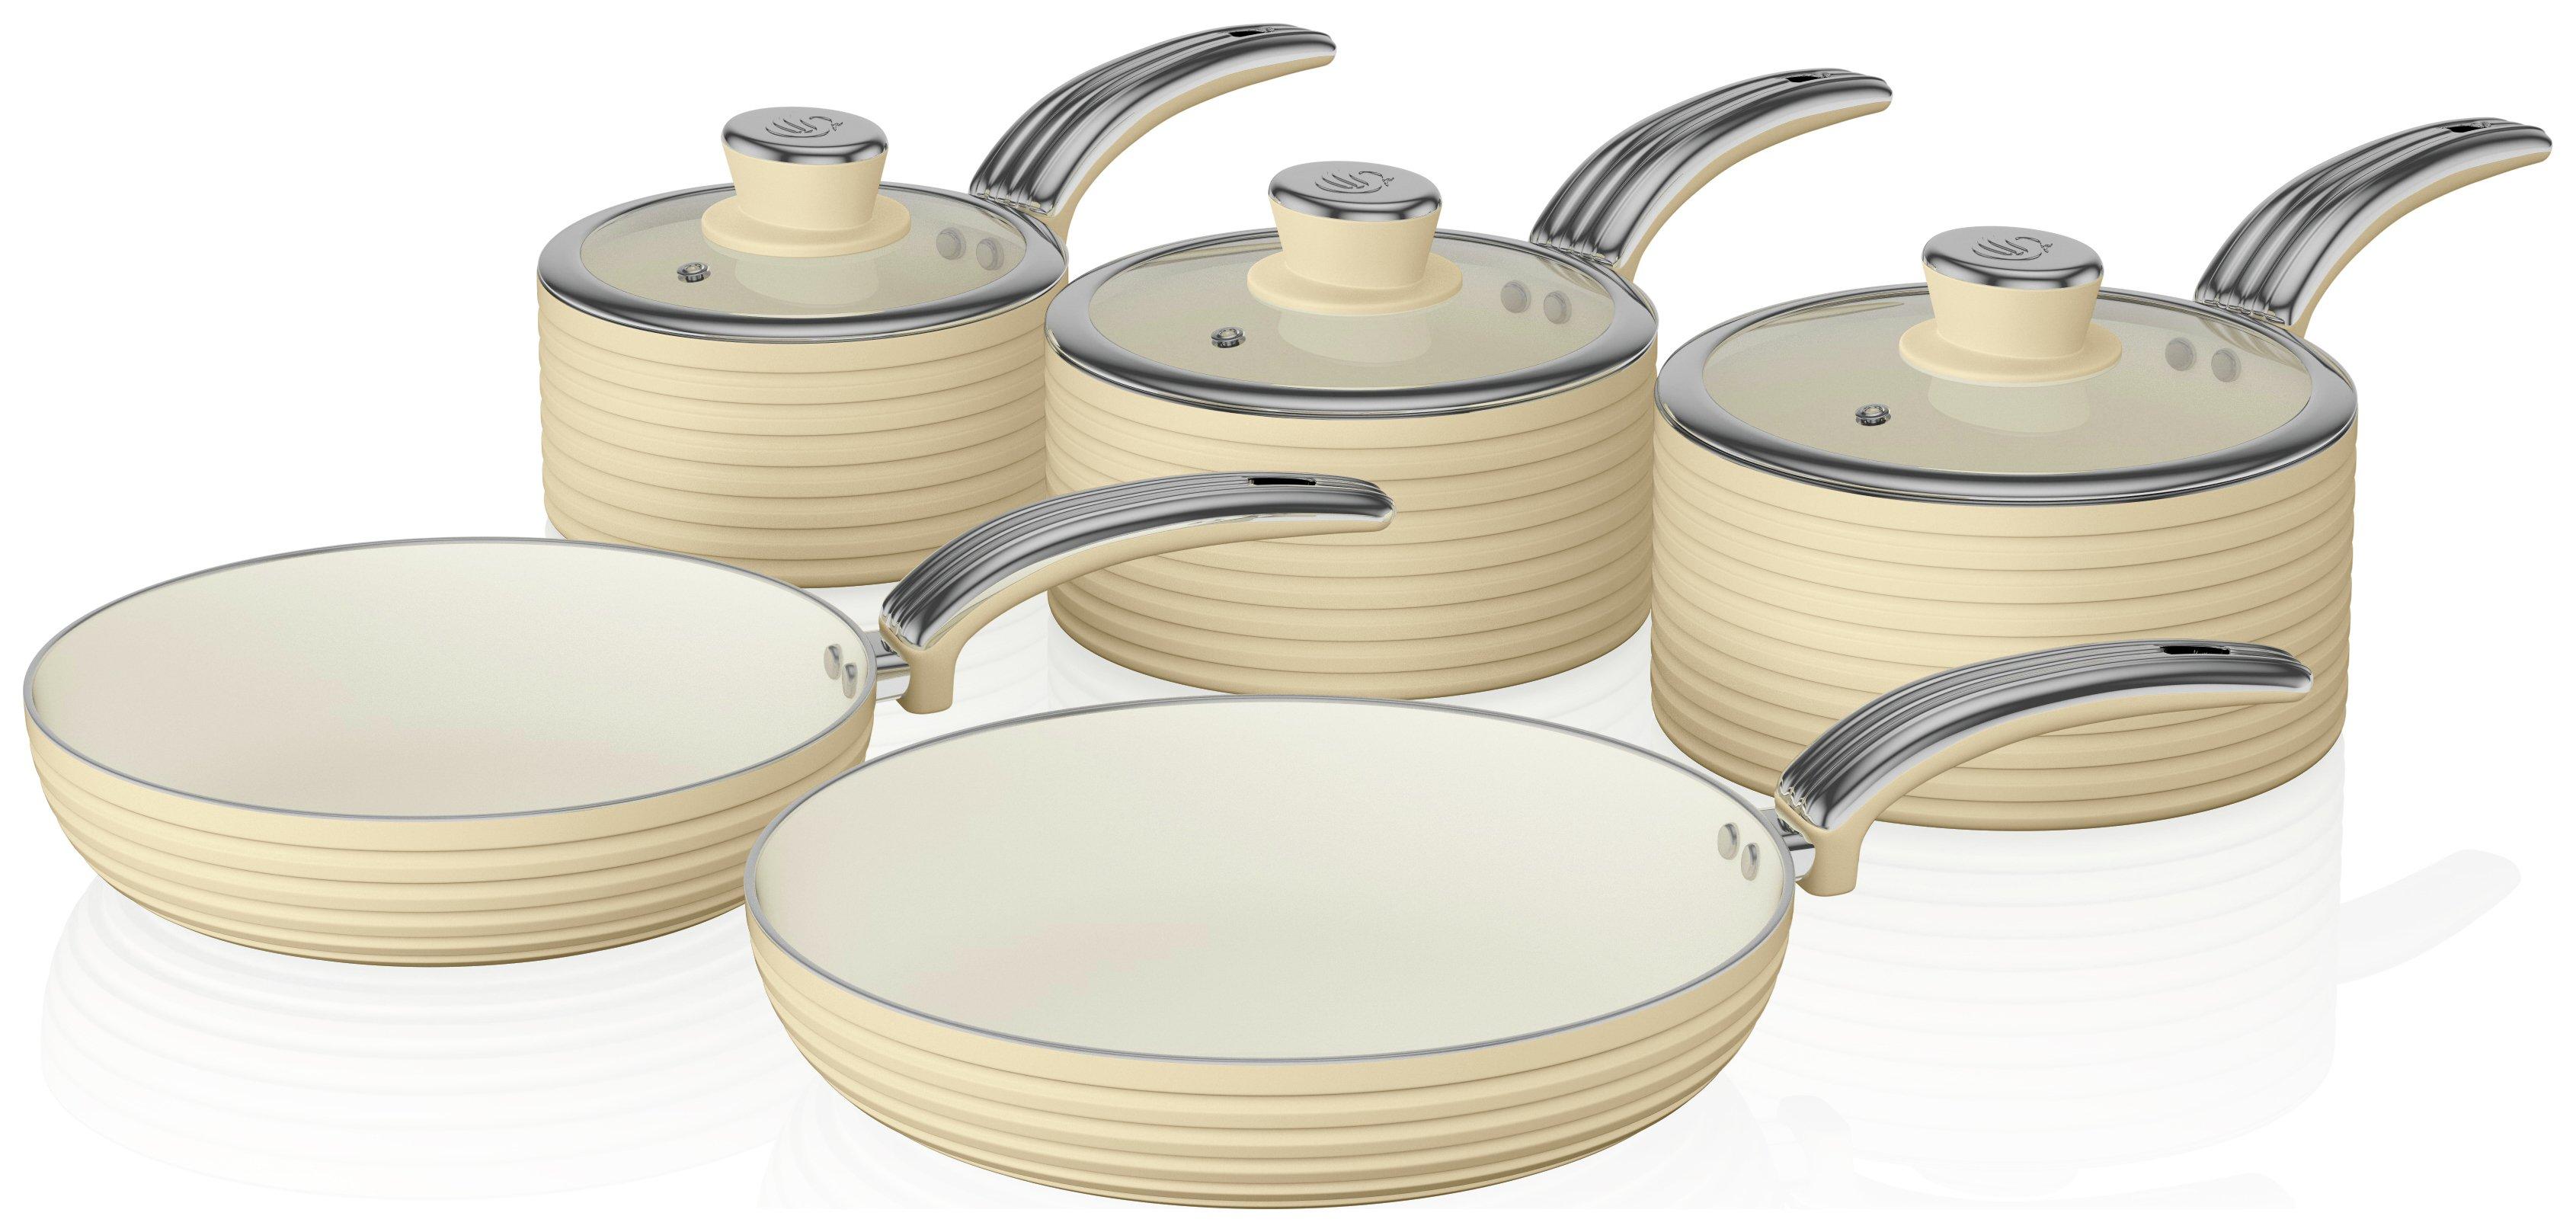 Swan Retro 5 Piece Pan Set - Cream